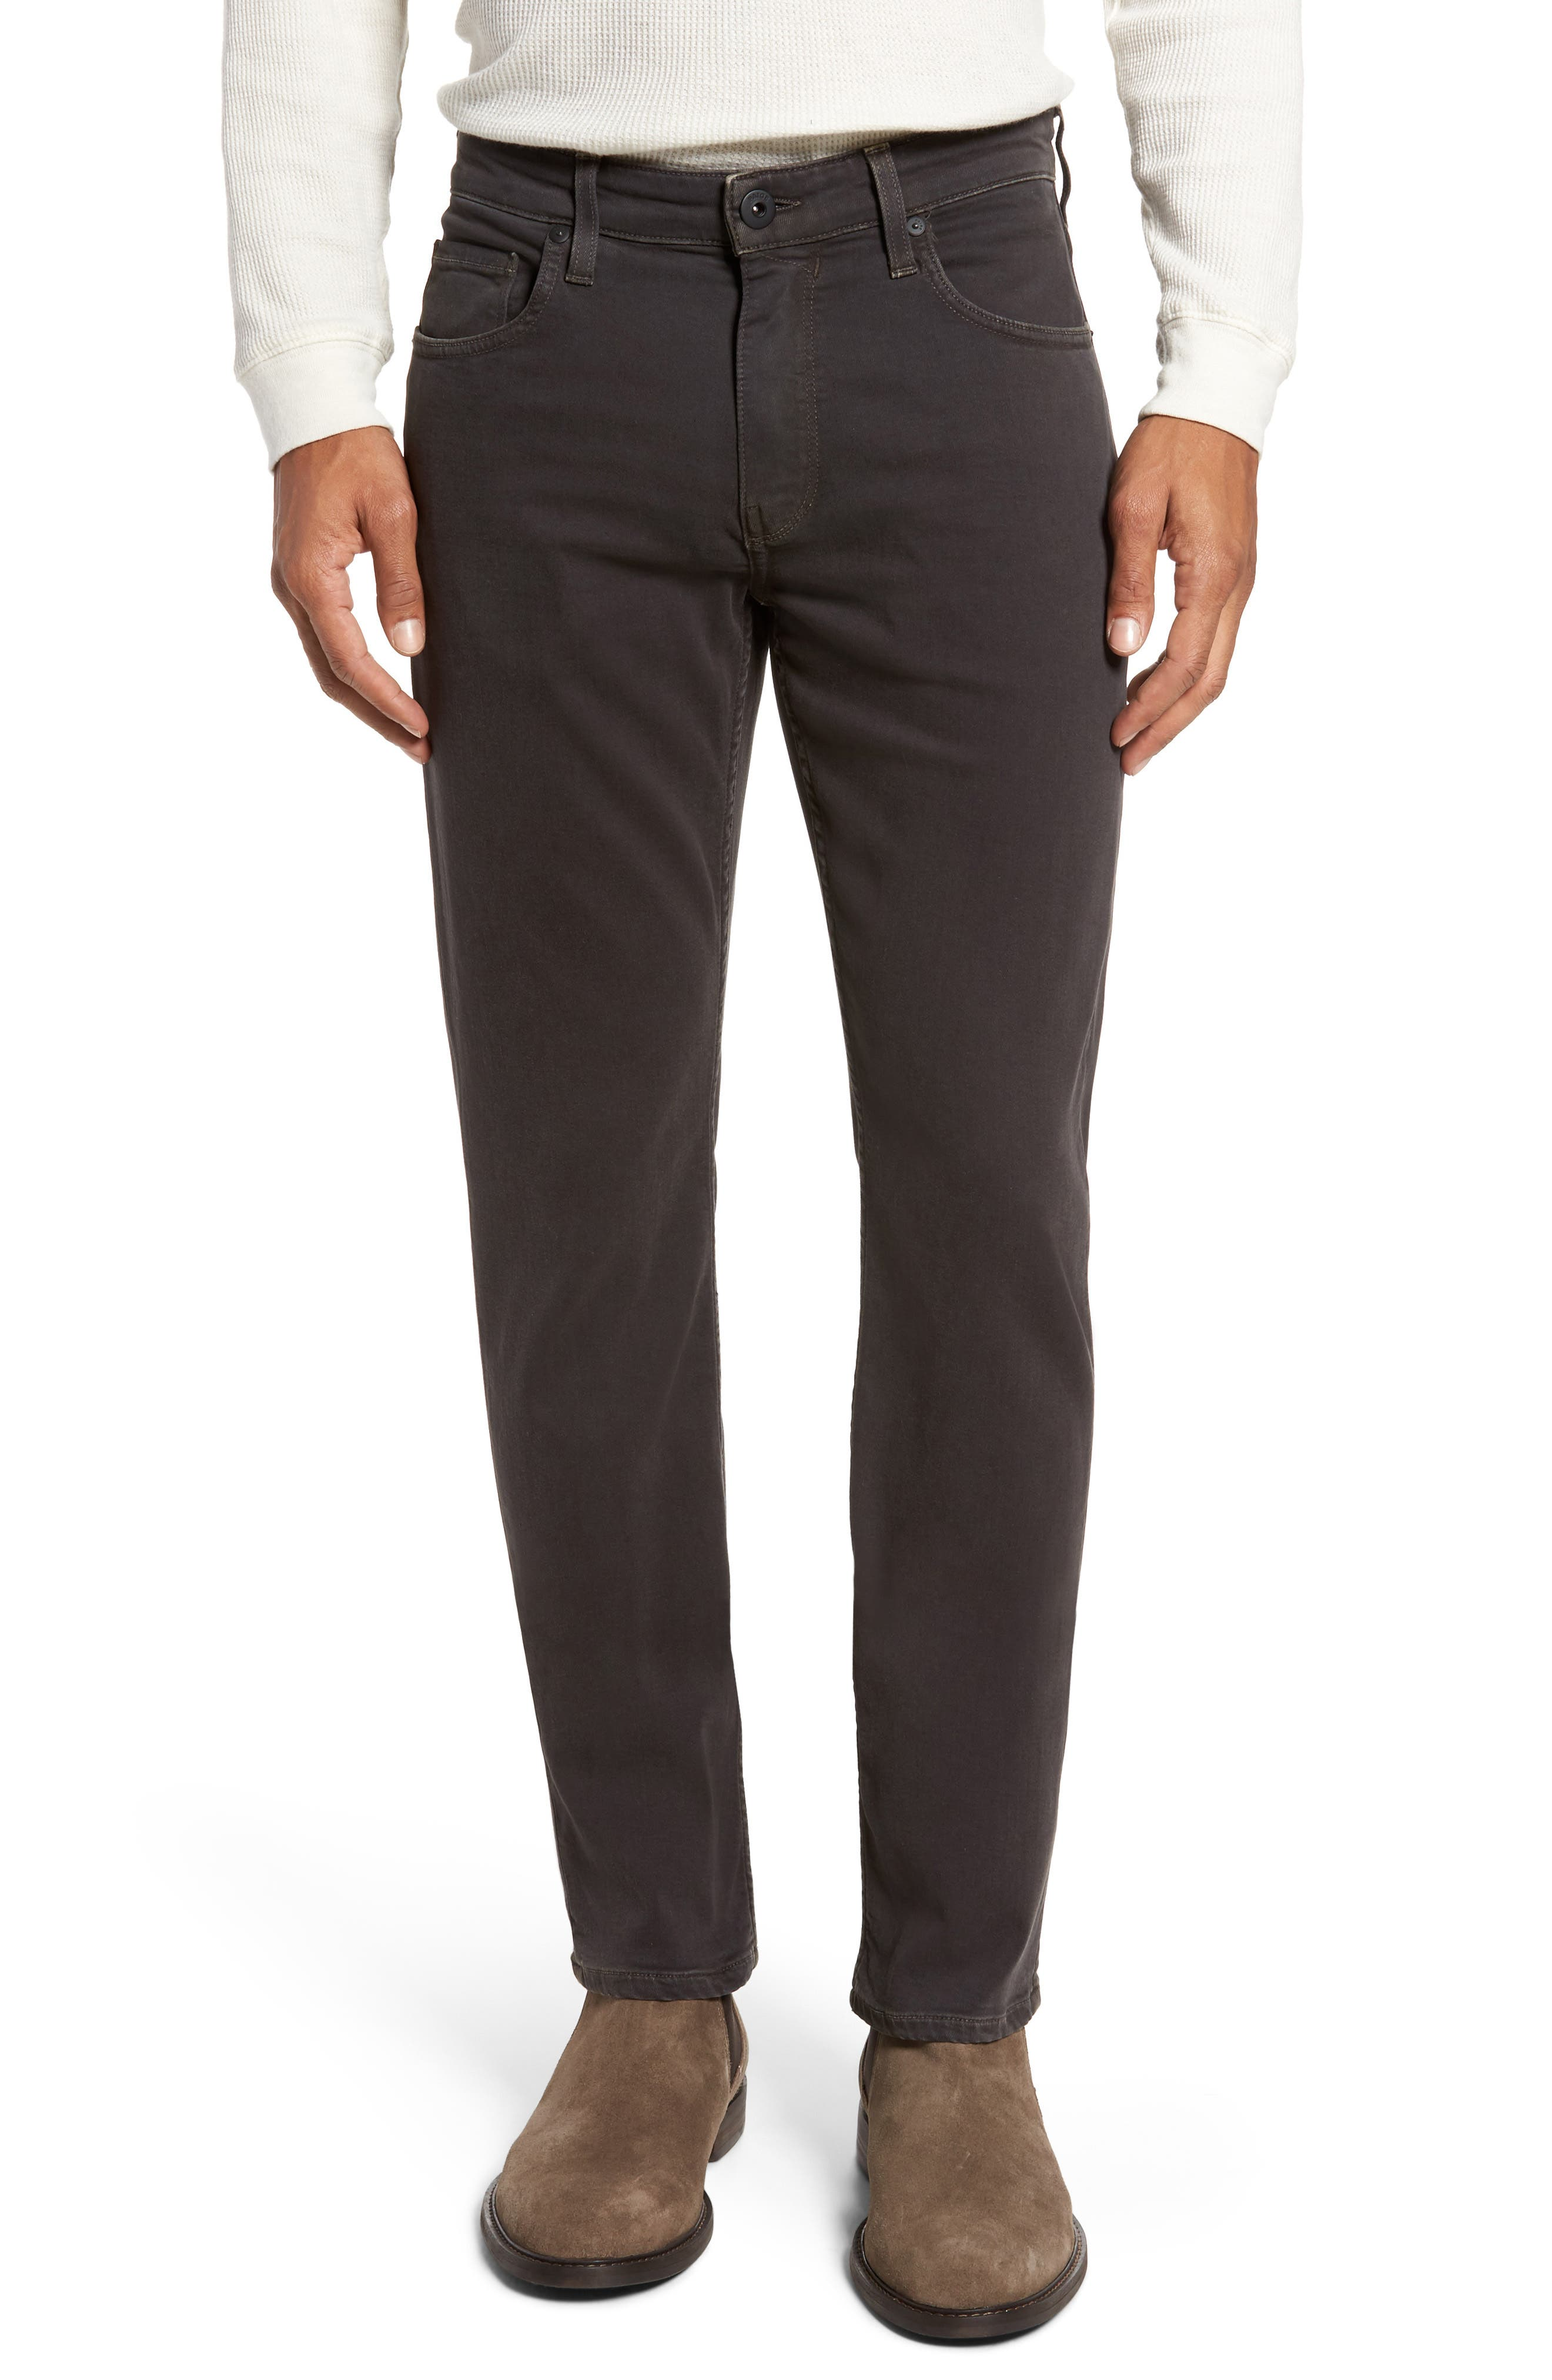 Main Image - PAIGE Transcend - Federal Slim Straight Leg Jeans (Vintage Black Fade)